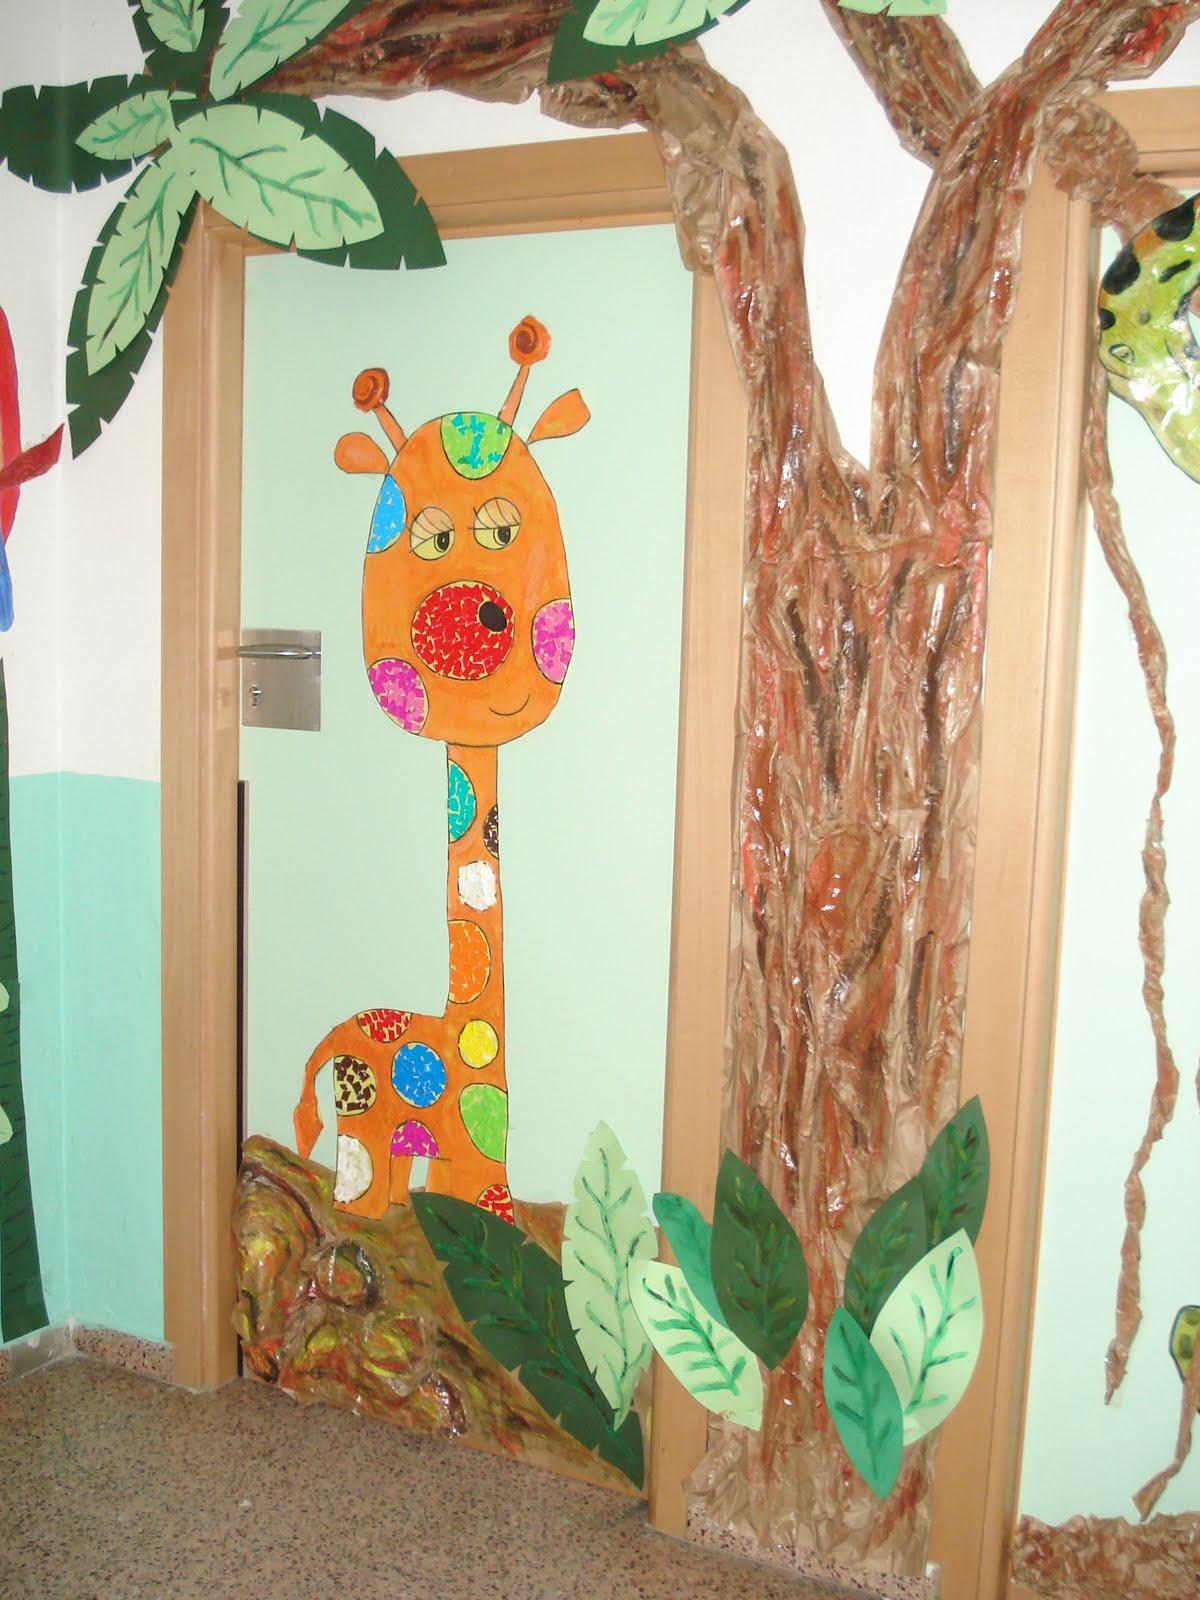 Recursos de educaci n infantil febrero 2011 for Decoracion de puertas infantiles